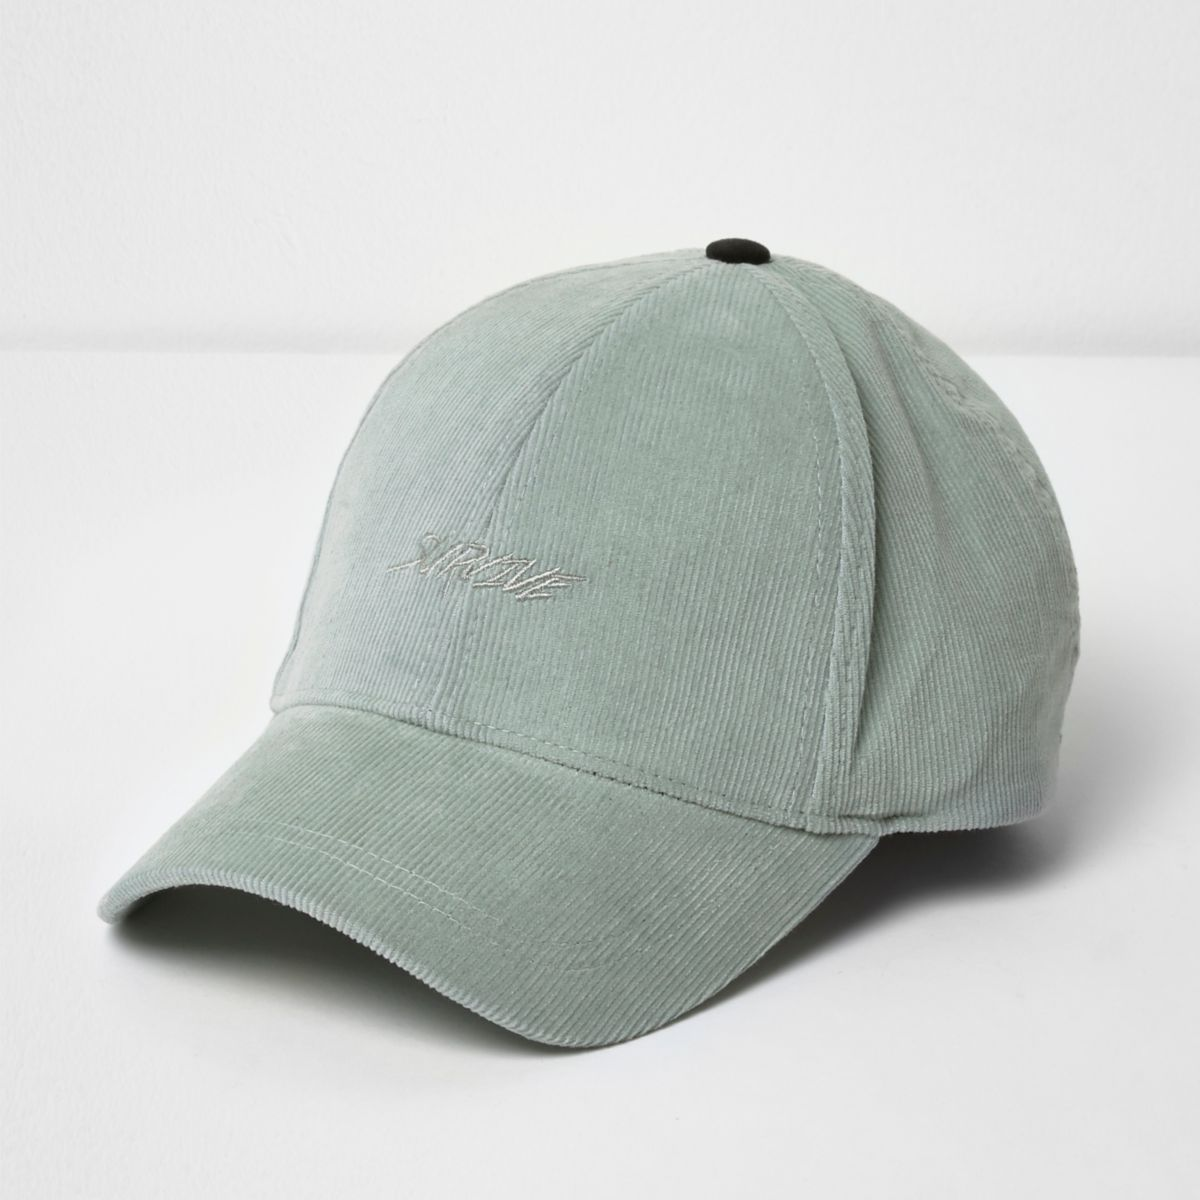 Green cord 'survive' cap